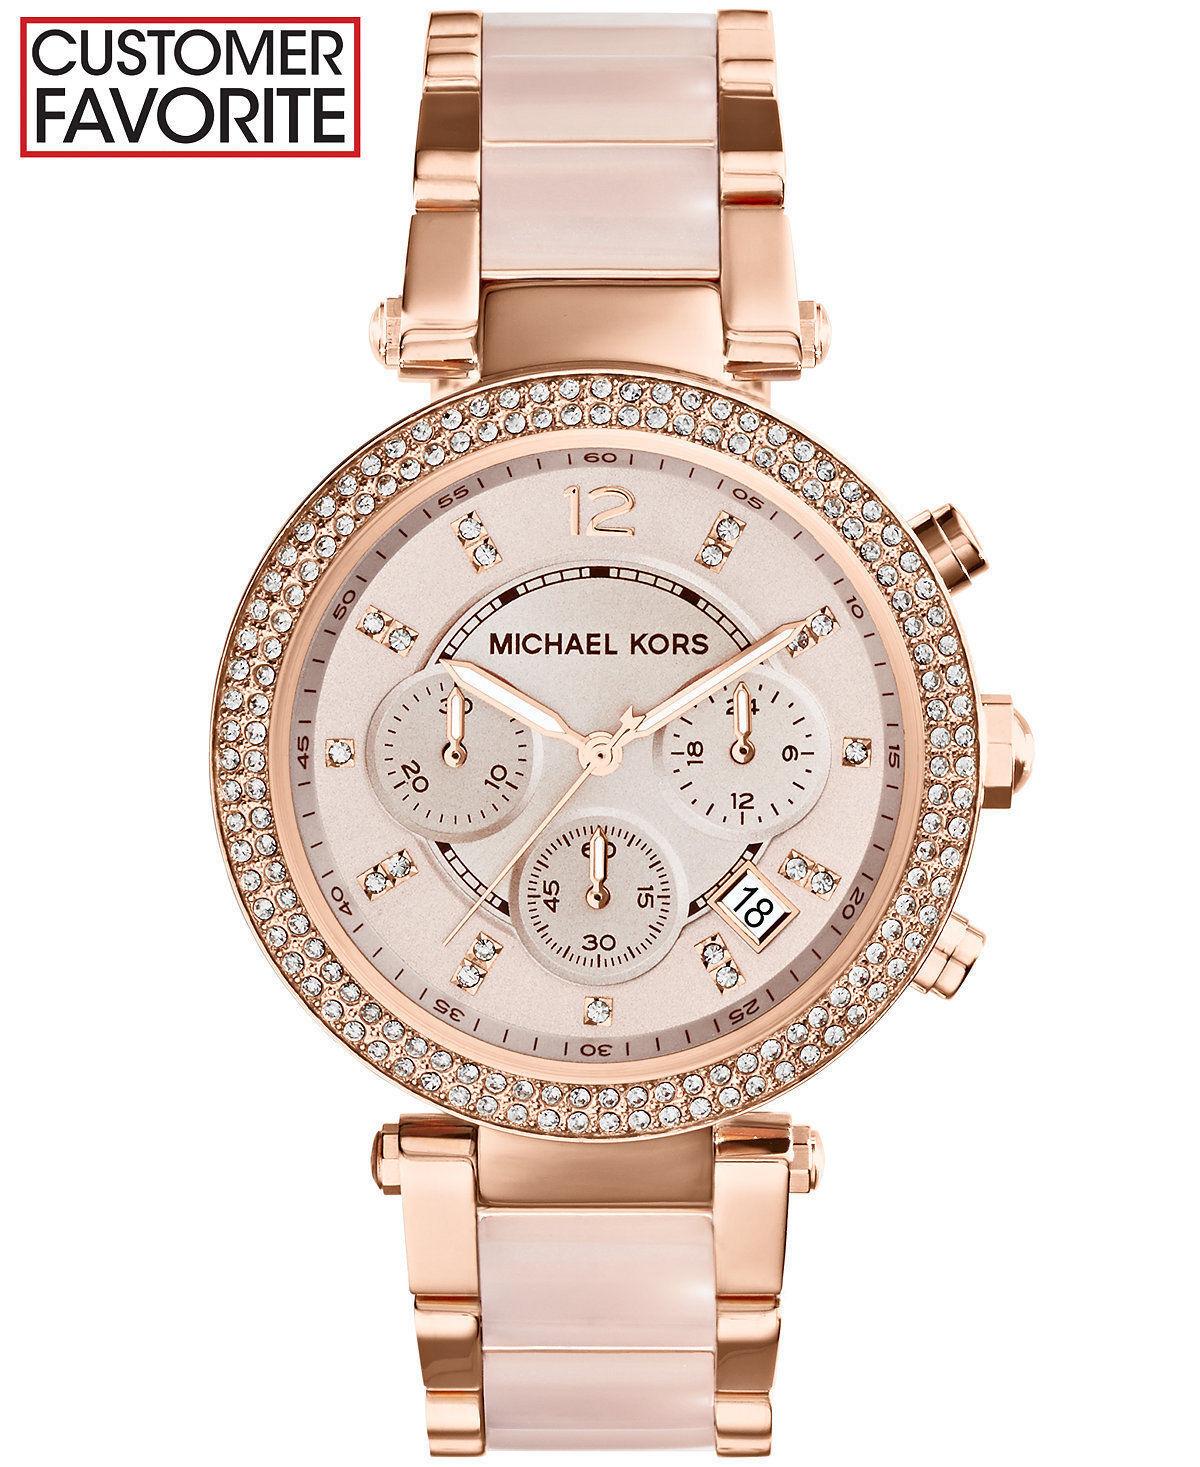 Купить Michael Kors Michael Kors Parker - New Michael Kors Parker Rose Gold Blush MK5896 Watch for Women Blush Crystal Set